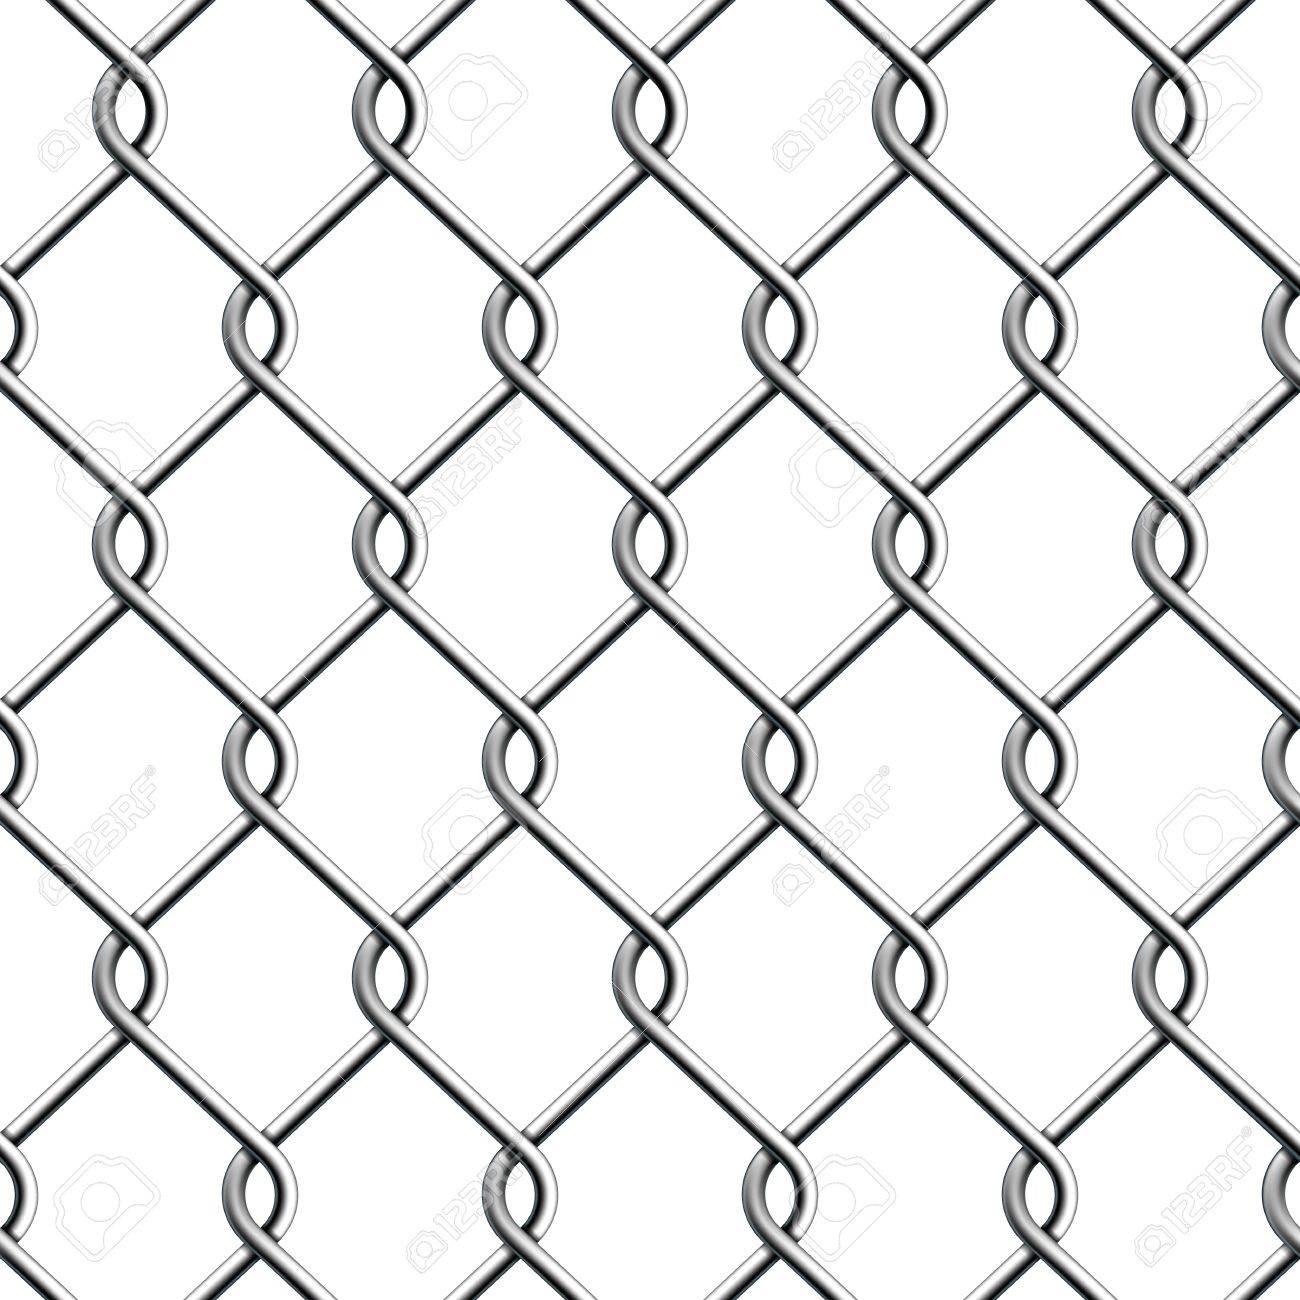 Seamless Chain Fence  Vector illustration Stock Vector - 18991456